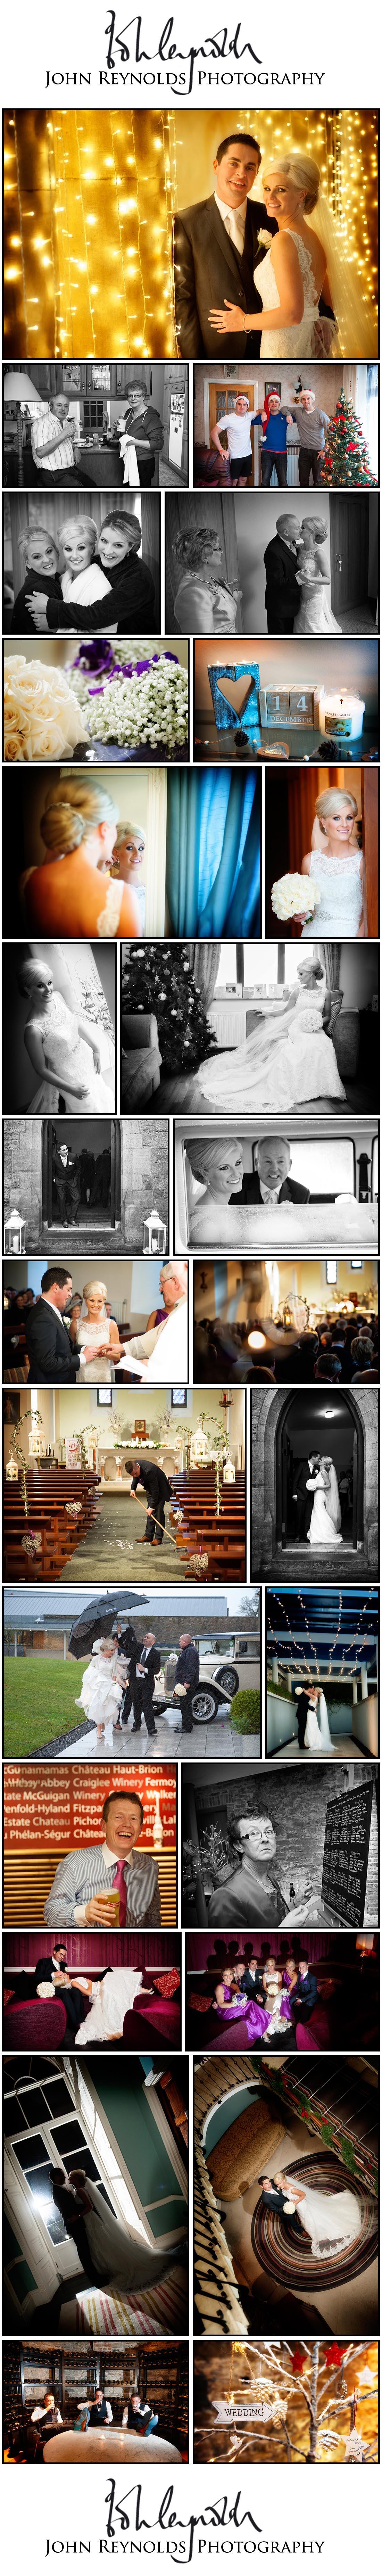 Blog Collage-Joanne & Fergus